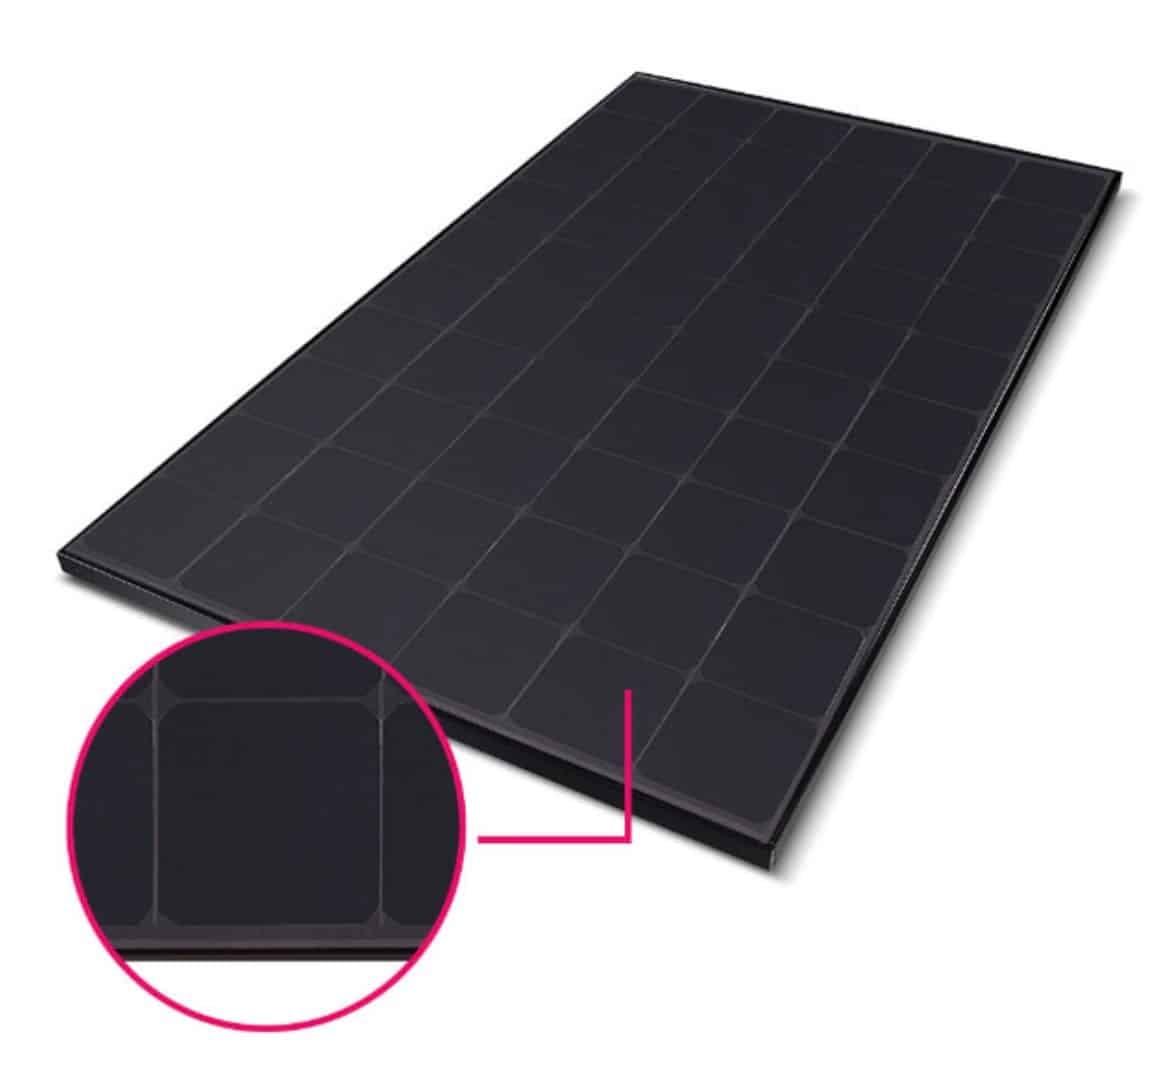 LG NeON R LG-360Q1K-V5 Black/Black Mono Solar Panel